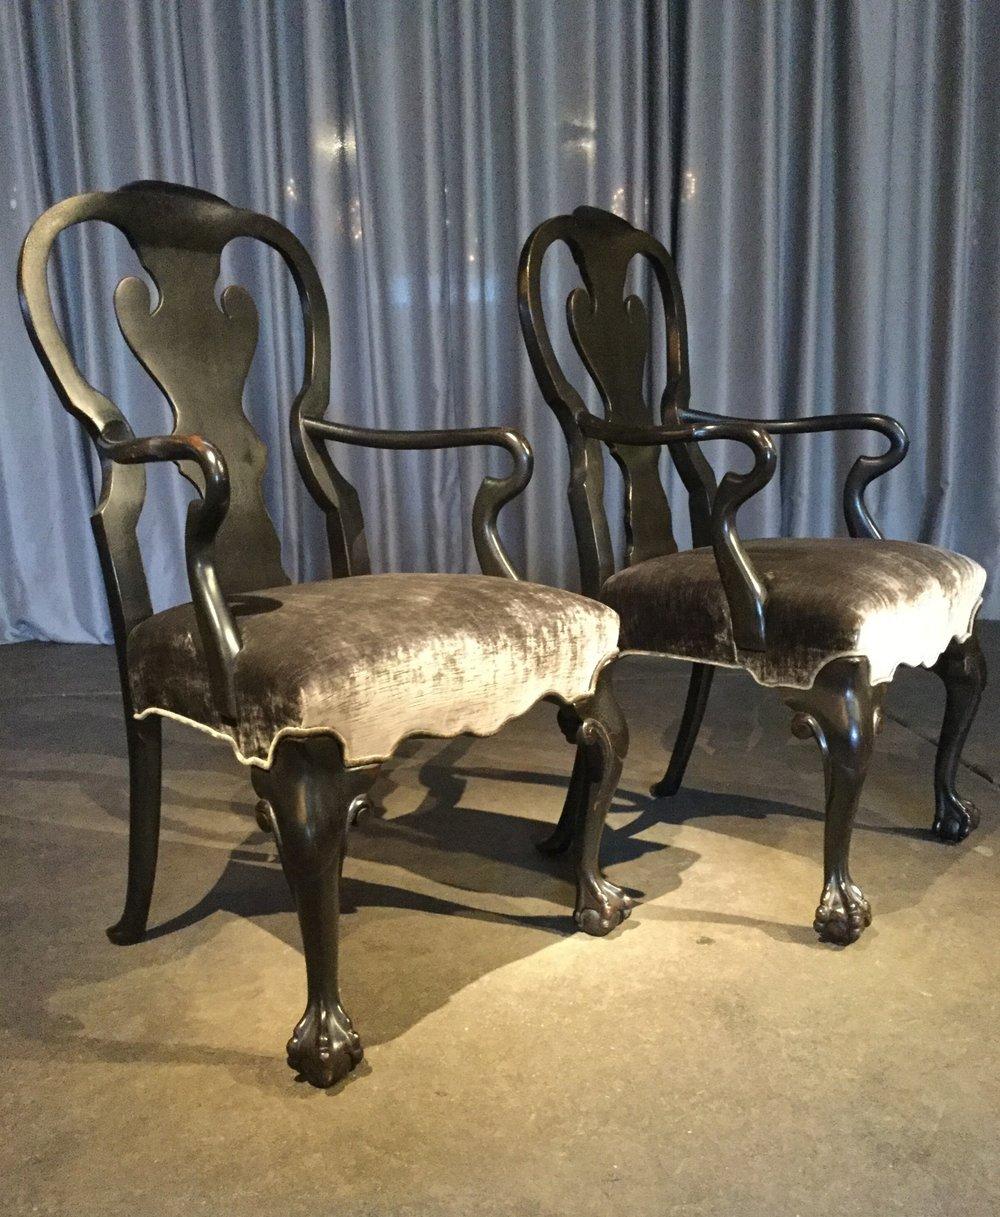 Host & Hostess Chairs, $2,800.00 pair